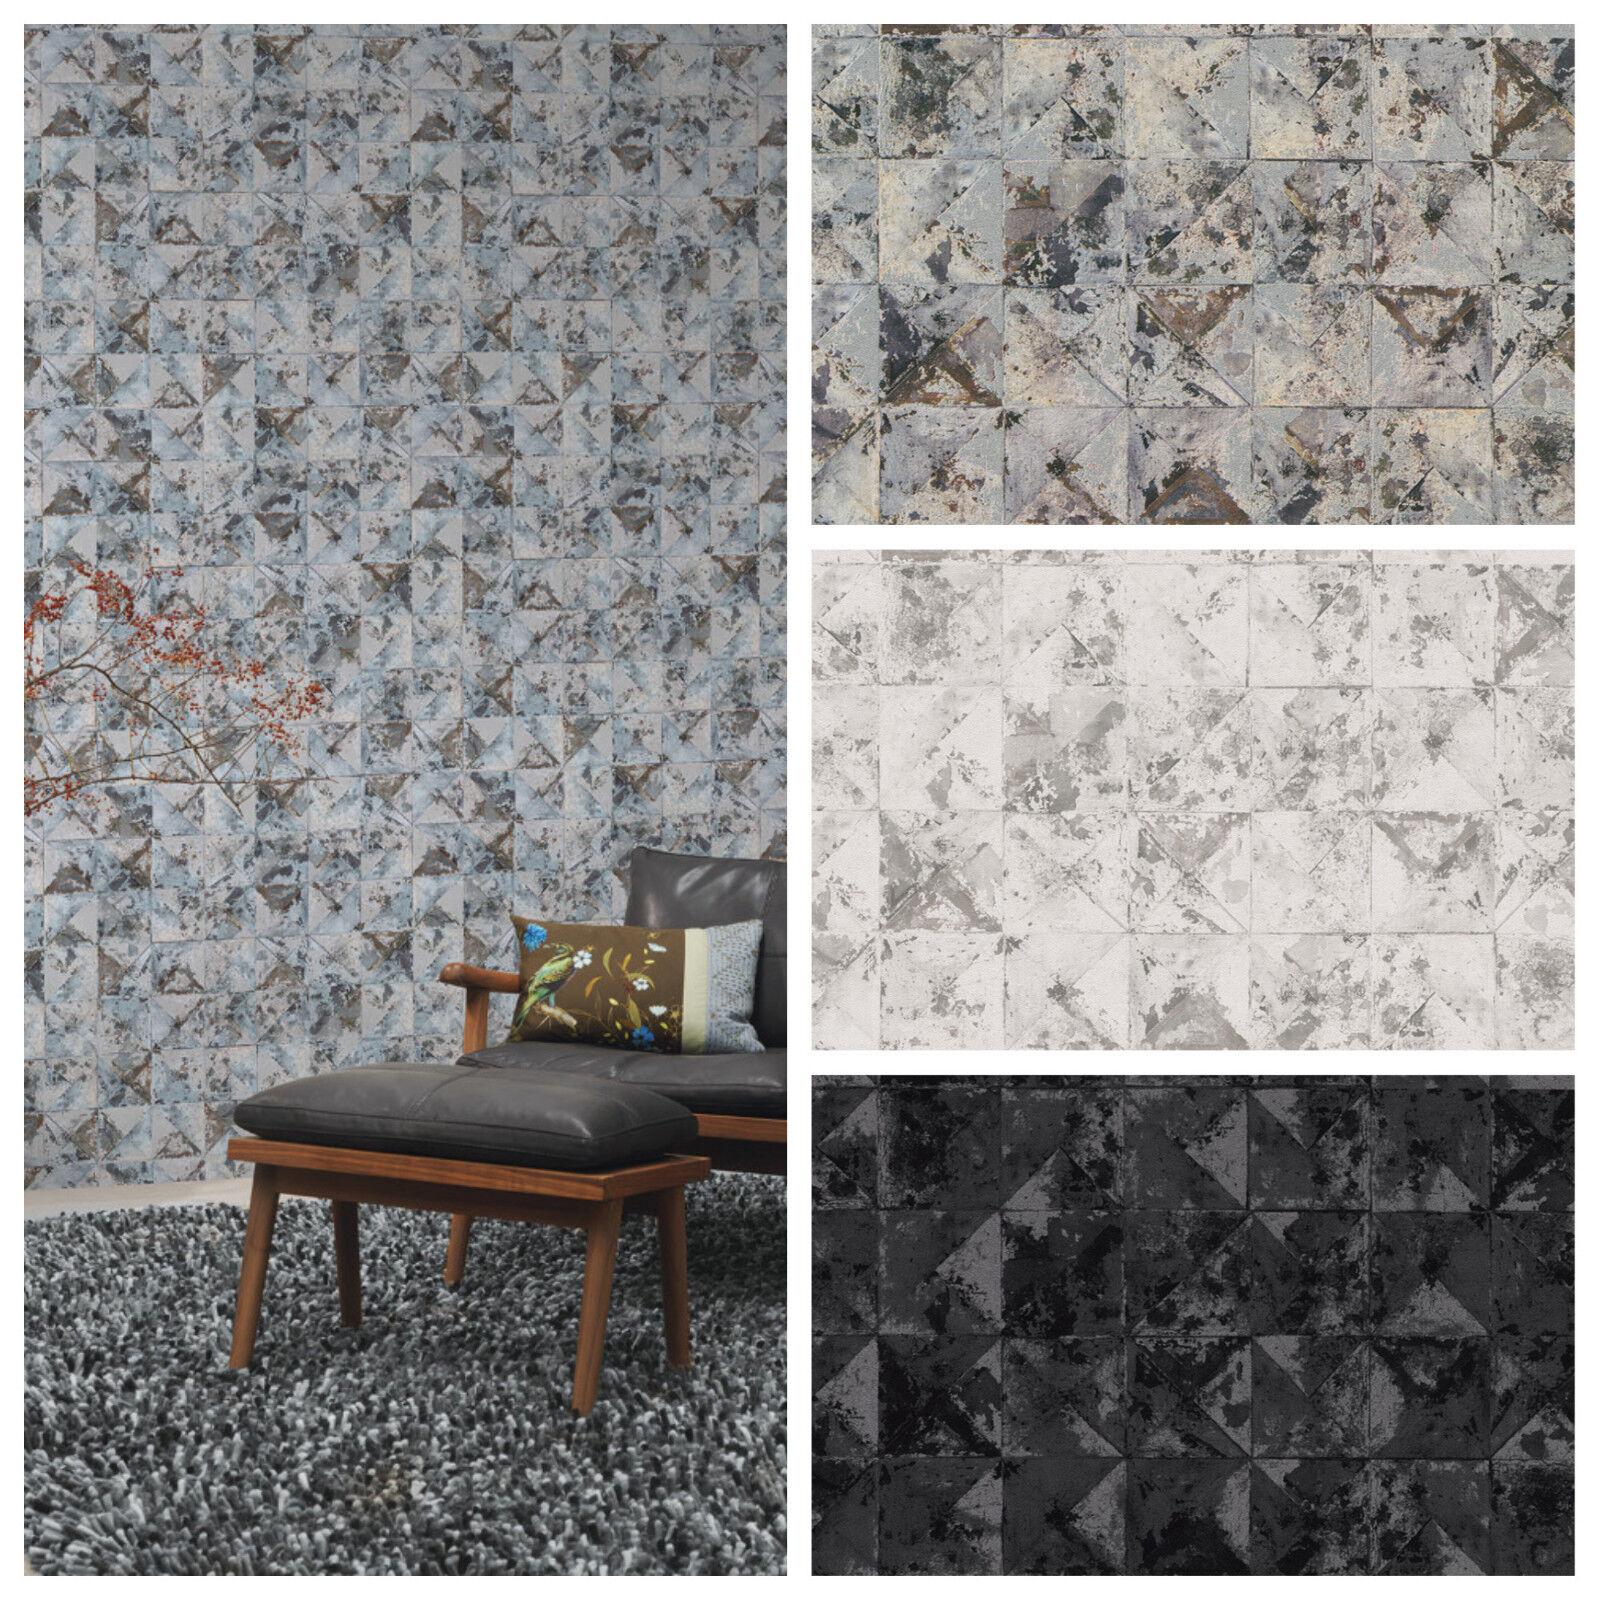 Vlies Tapete Beton Mosaik Fliesen Kacheln Grau Silber Schwarz